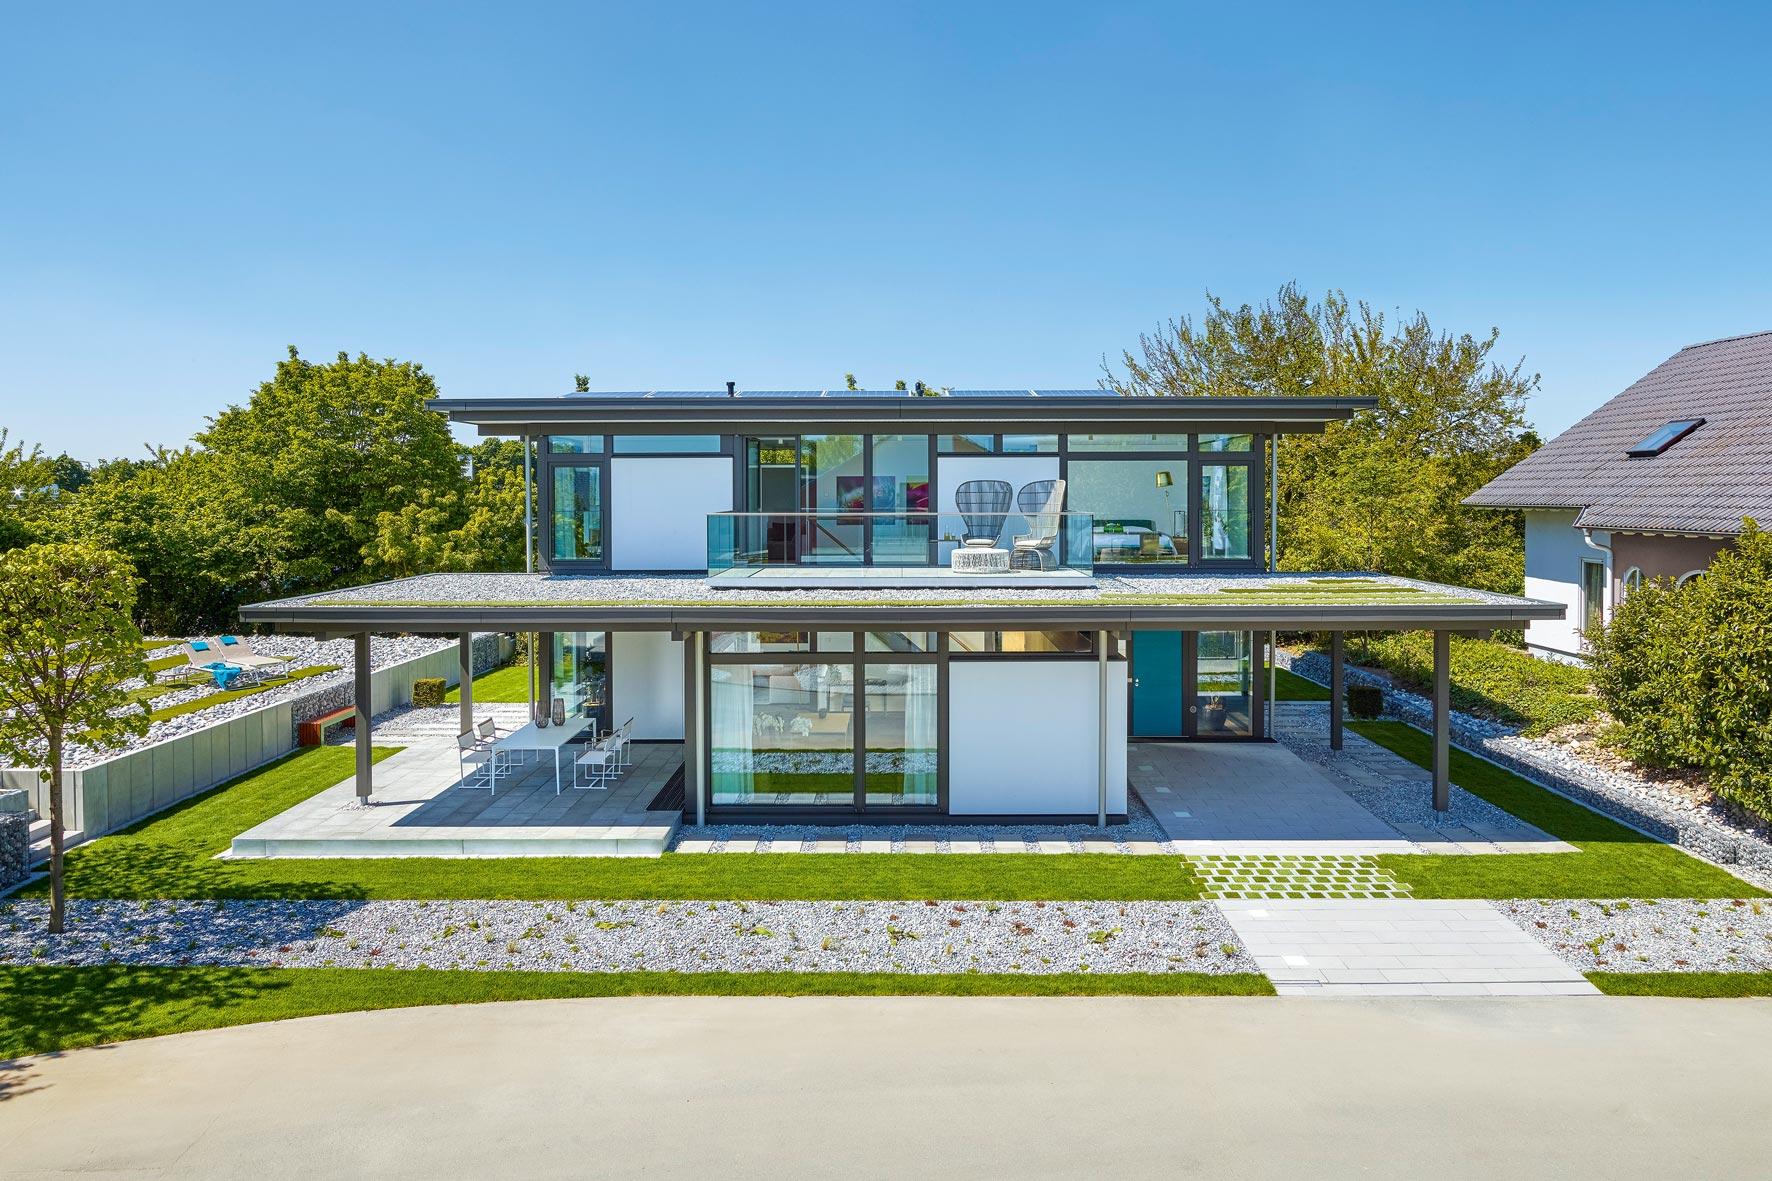 huf haus modum gr nes fachwerkhaus greenhome. Black Bedroom Furniture Sets. Home Design Ideas